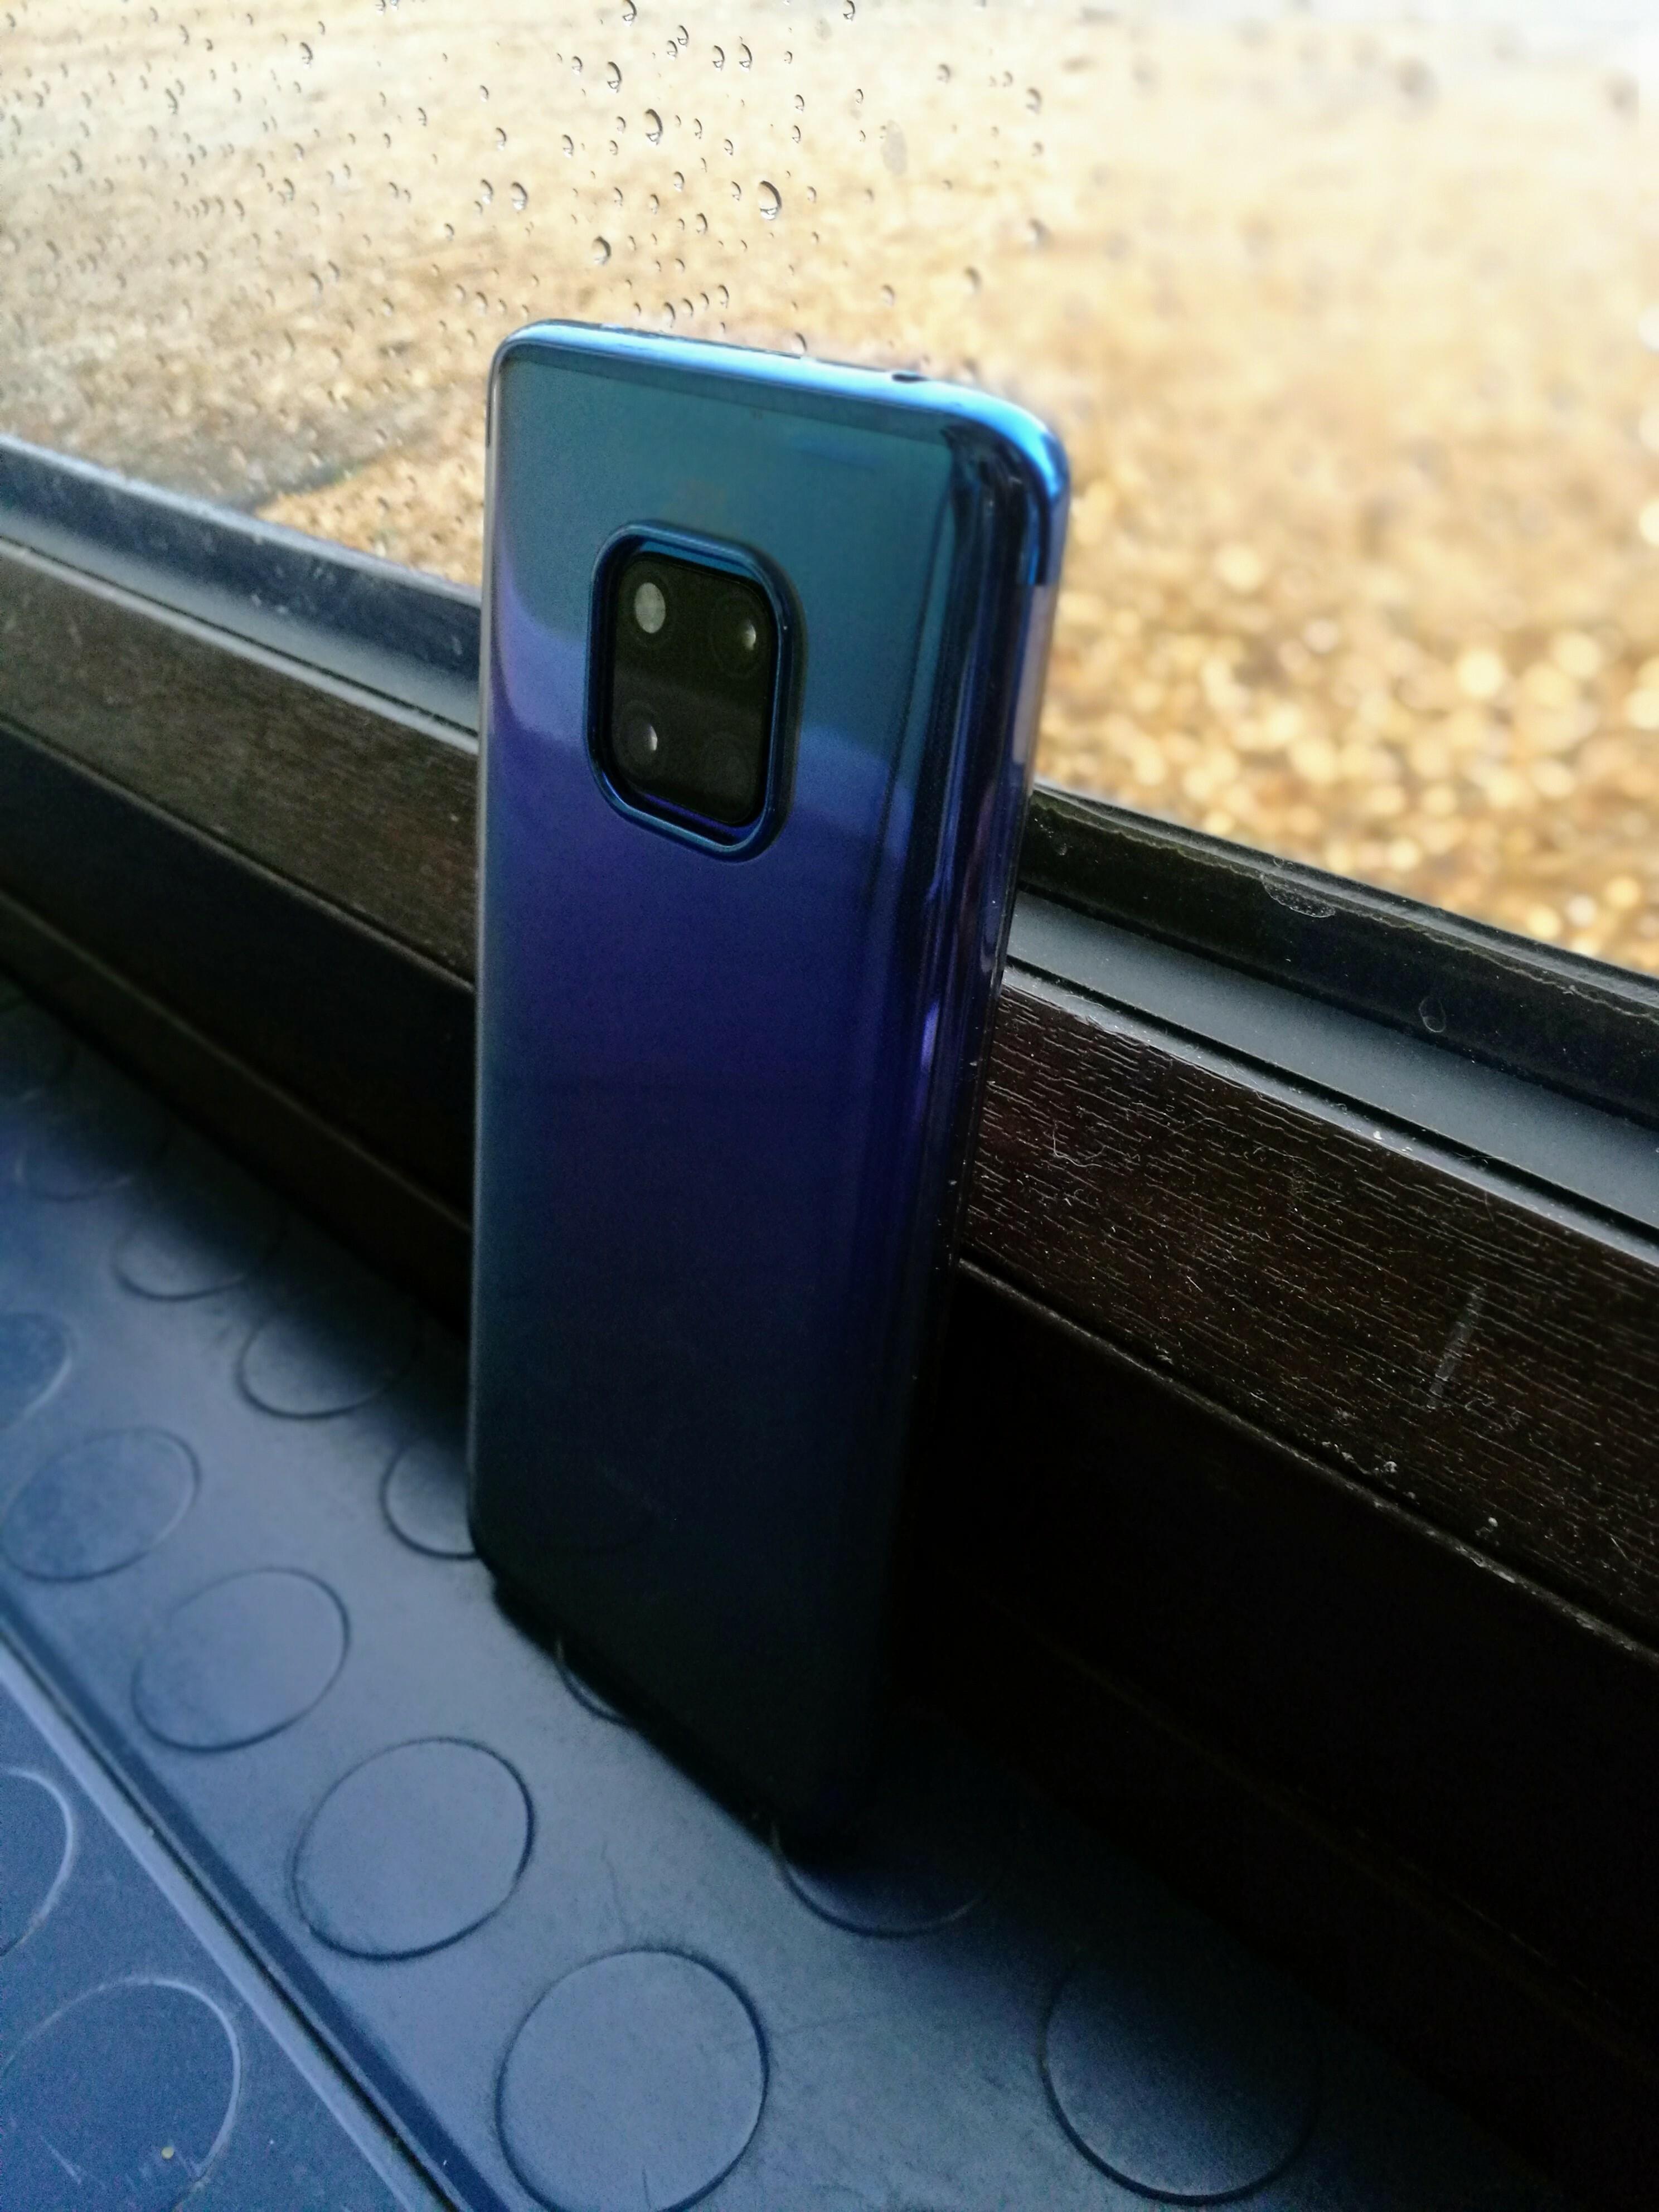 buy popular 72c4b 3b0db Where to buy original Huawei mate 20 pro cases? | Official Huawei ...